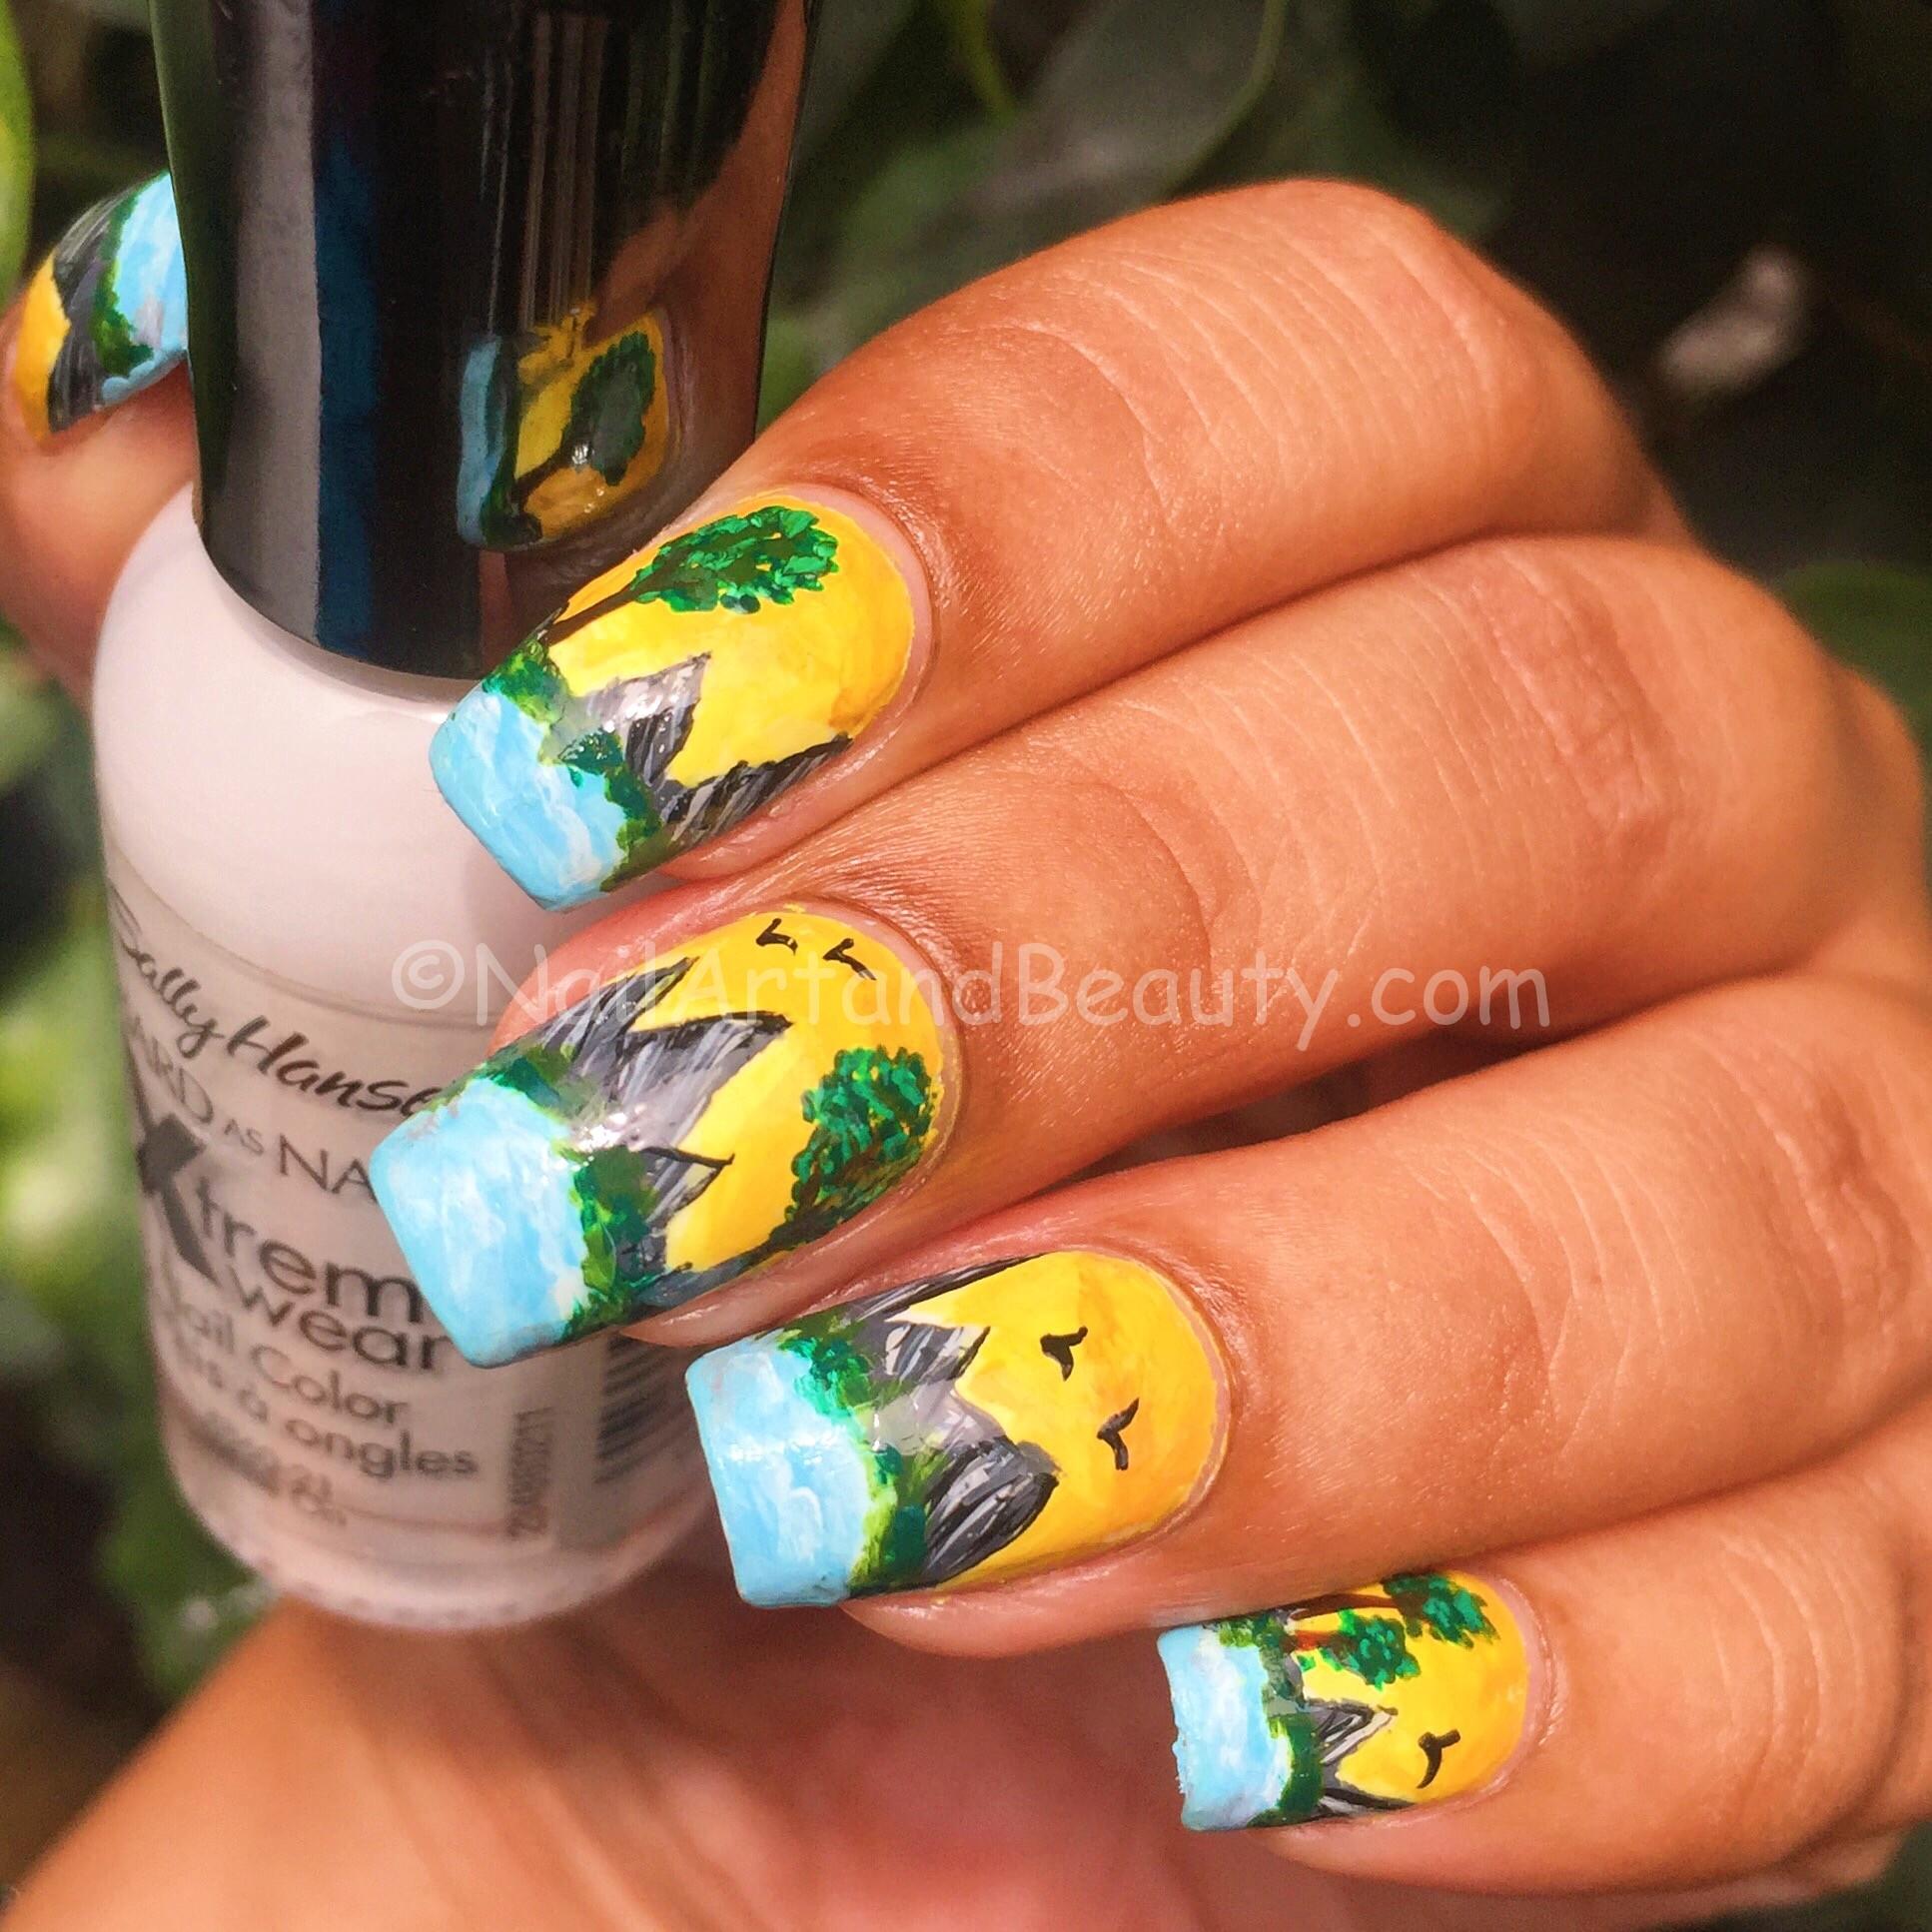 Scenery Nails